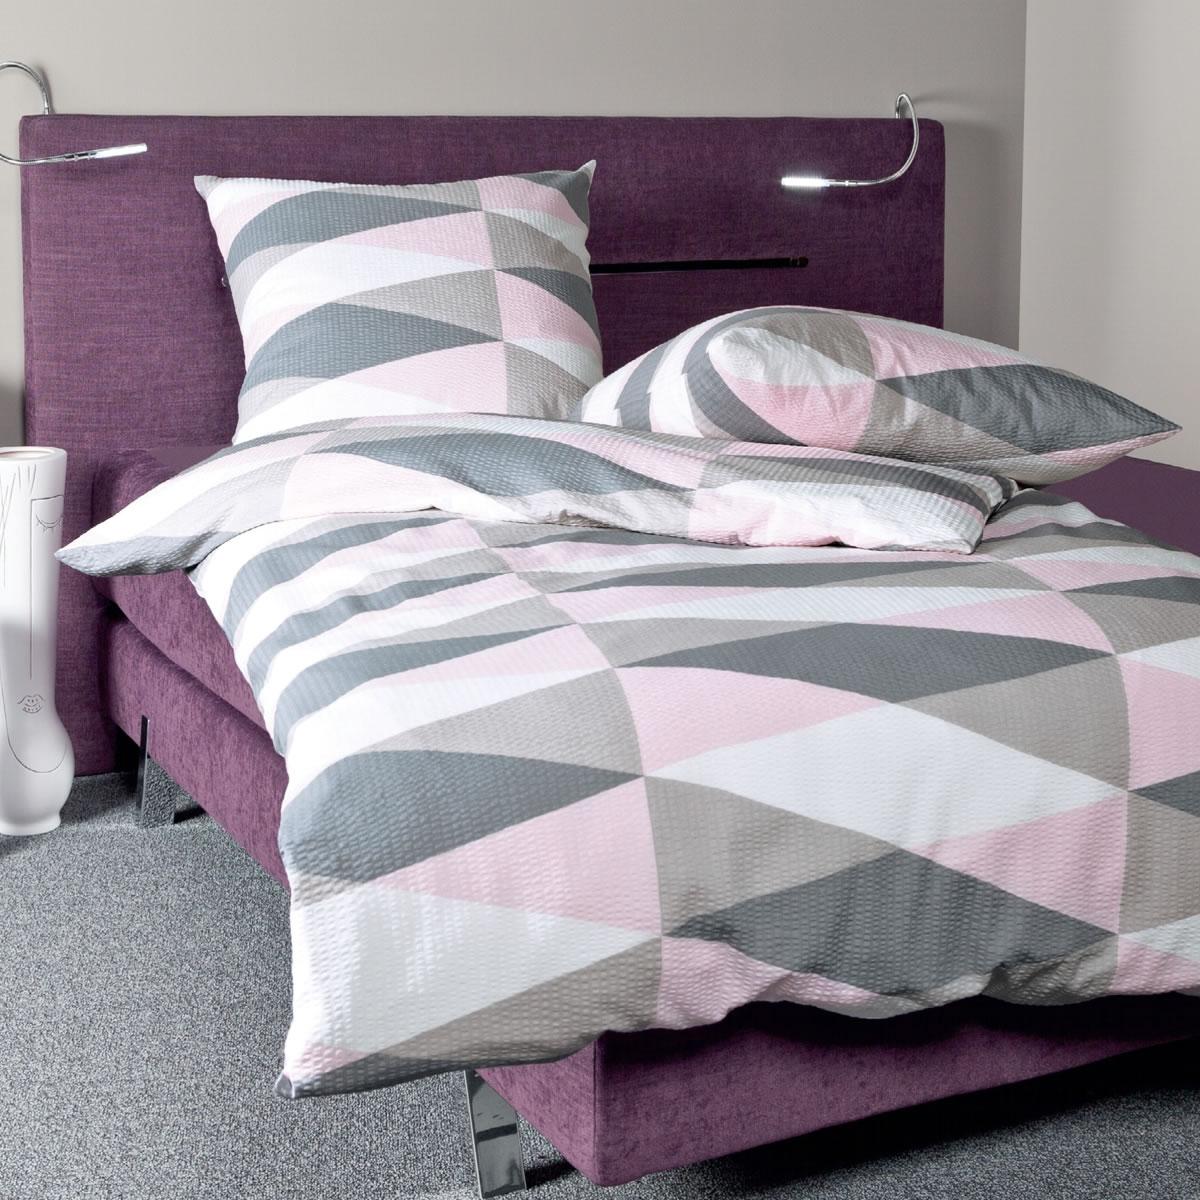 janine mako soft seersucker bettw sche in 135x200 cm 1b ware 20039 01. Black Bedroom Furniture Sets. Home Design Ideas